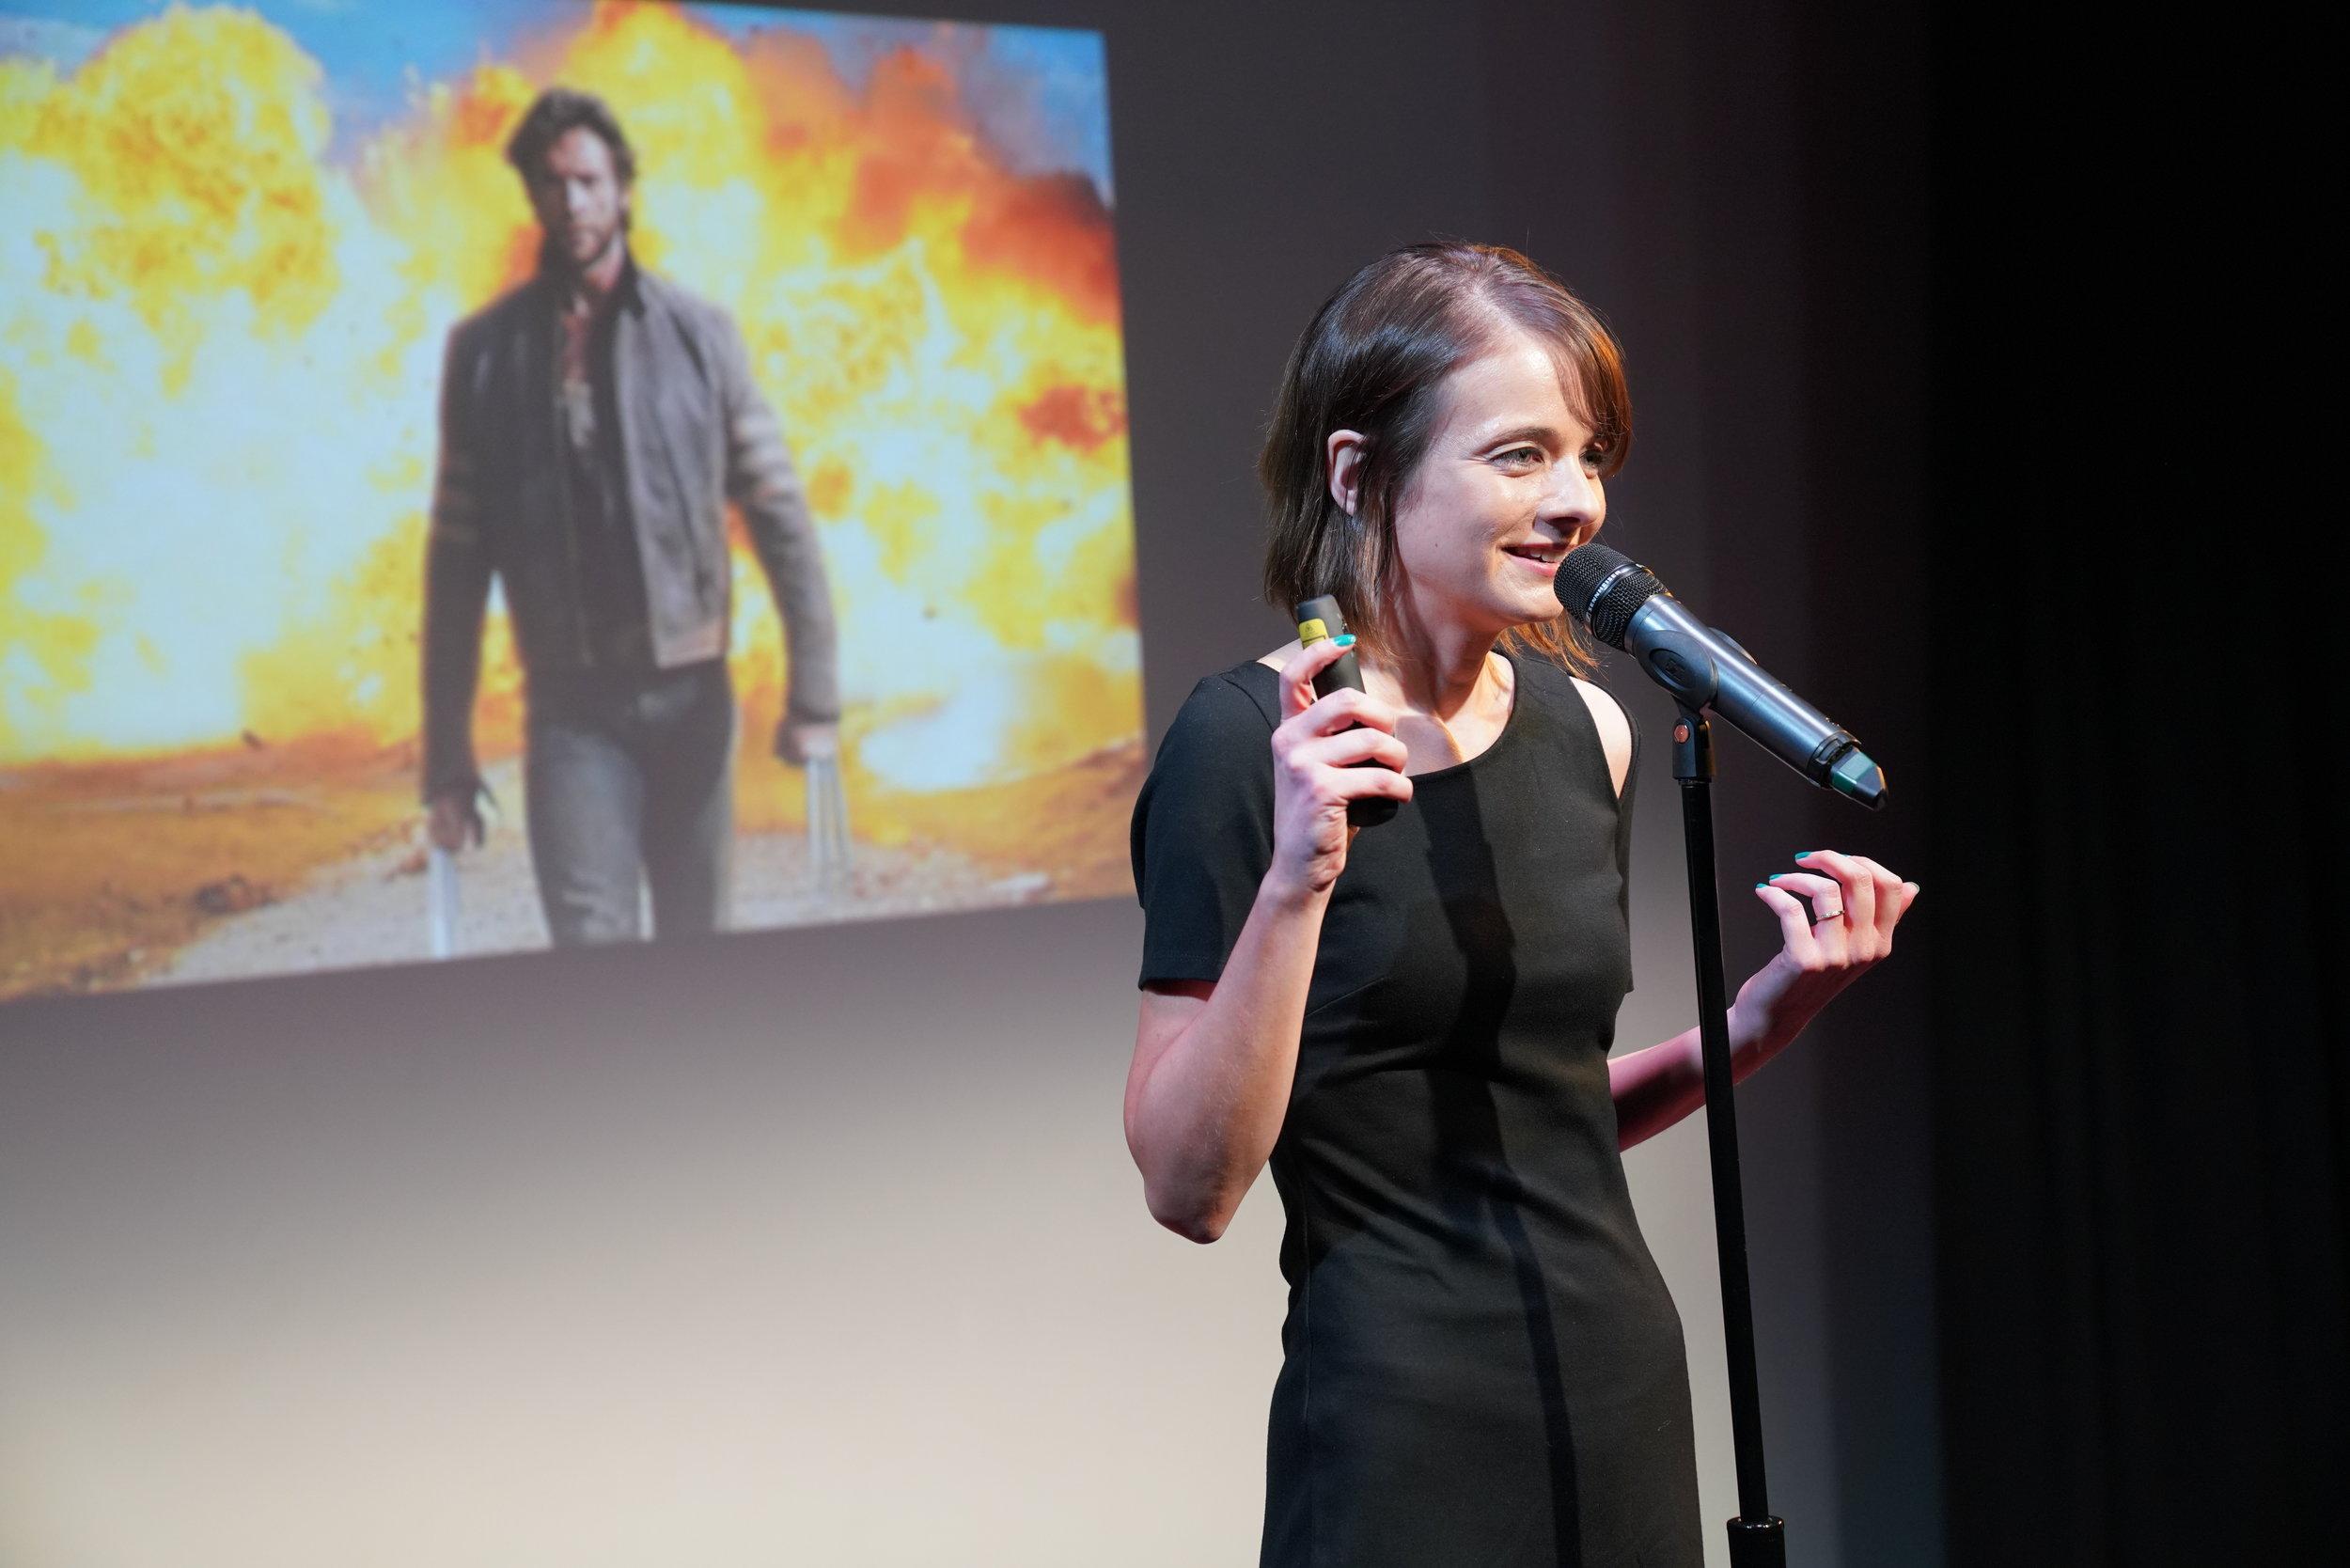 Erin Barker, artistic director of Story Collider